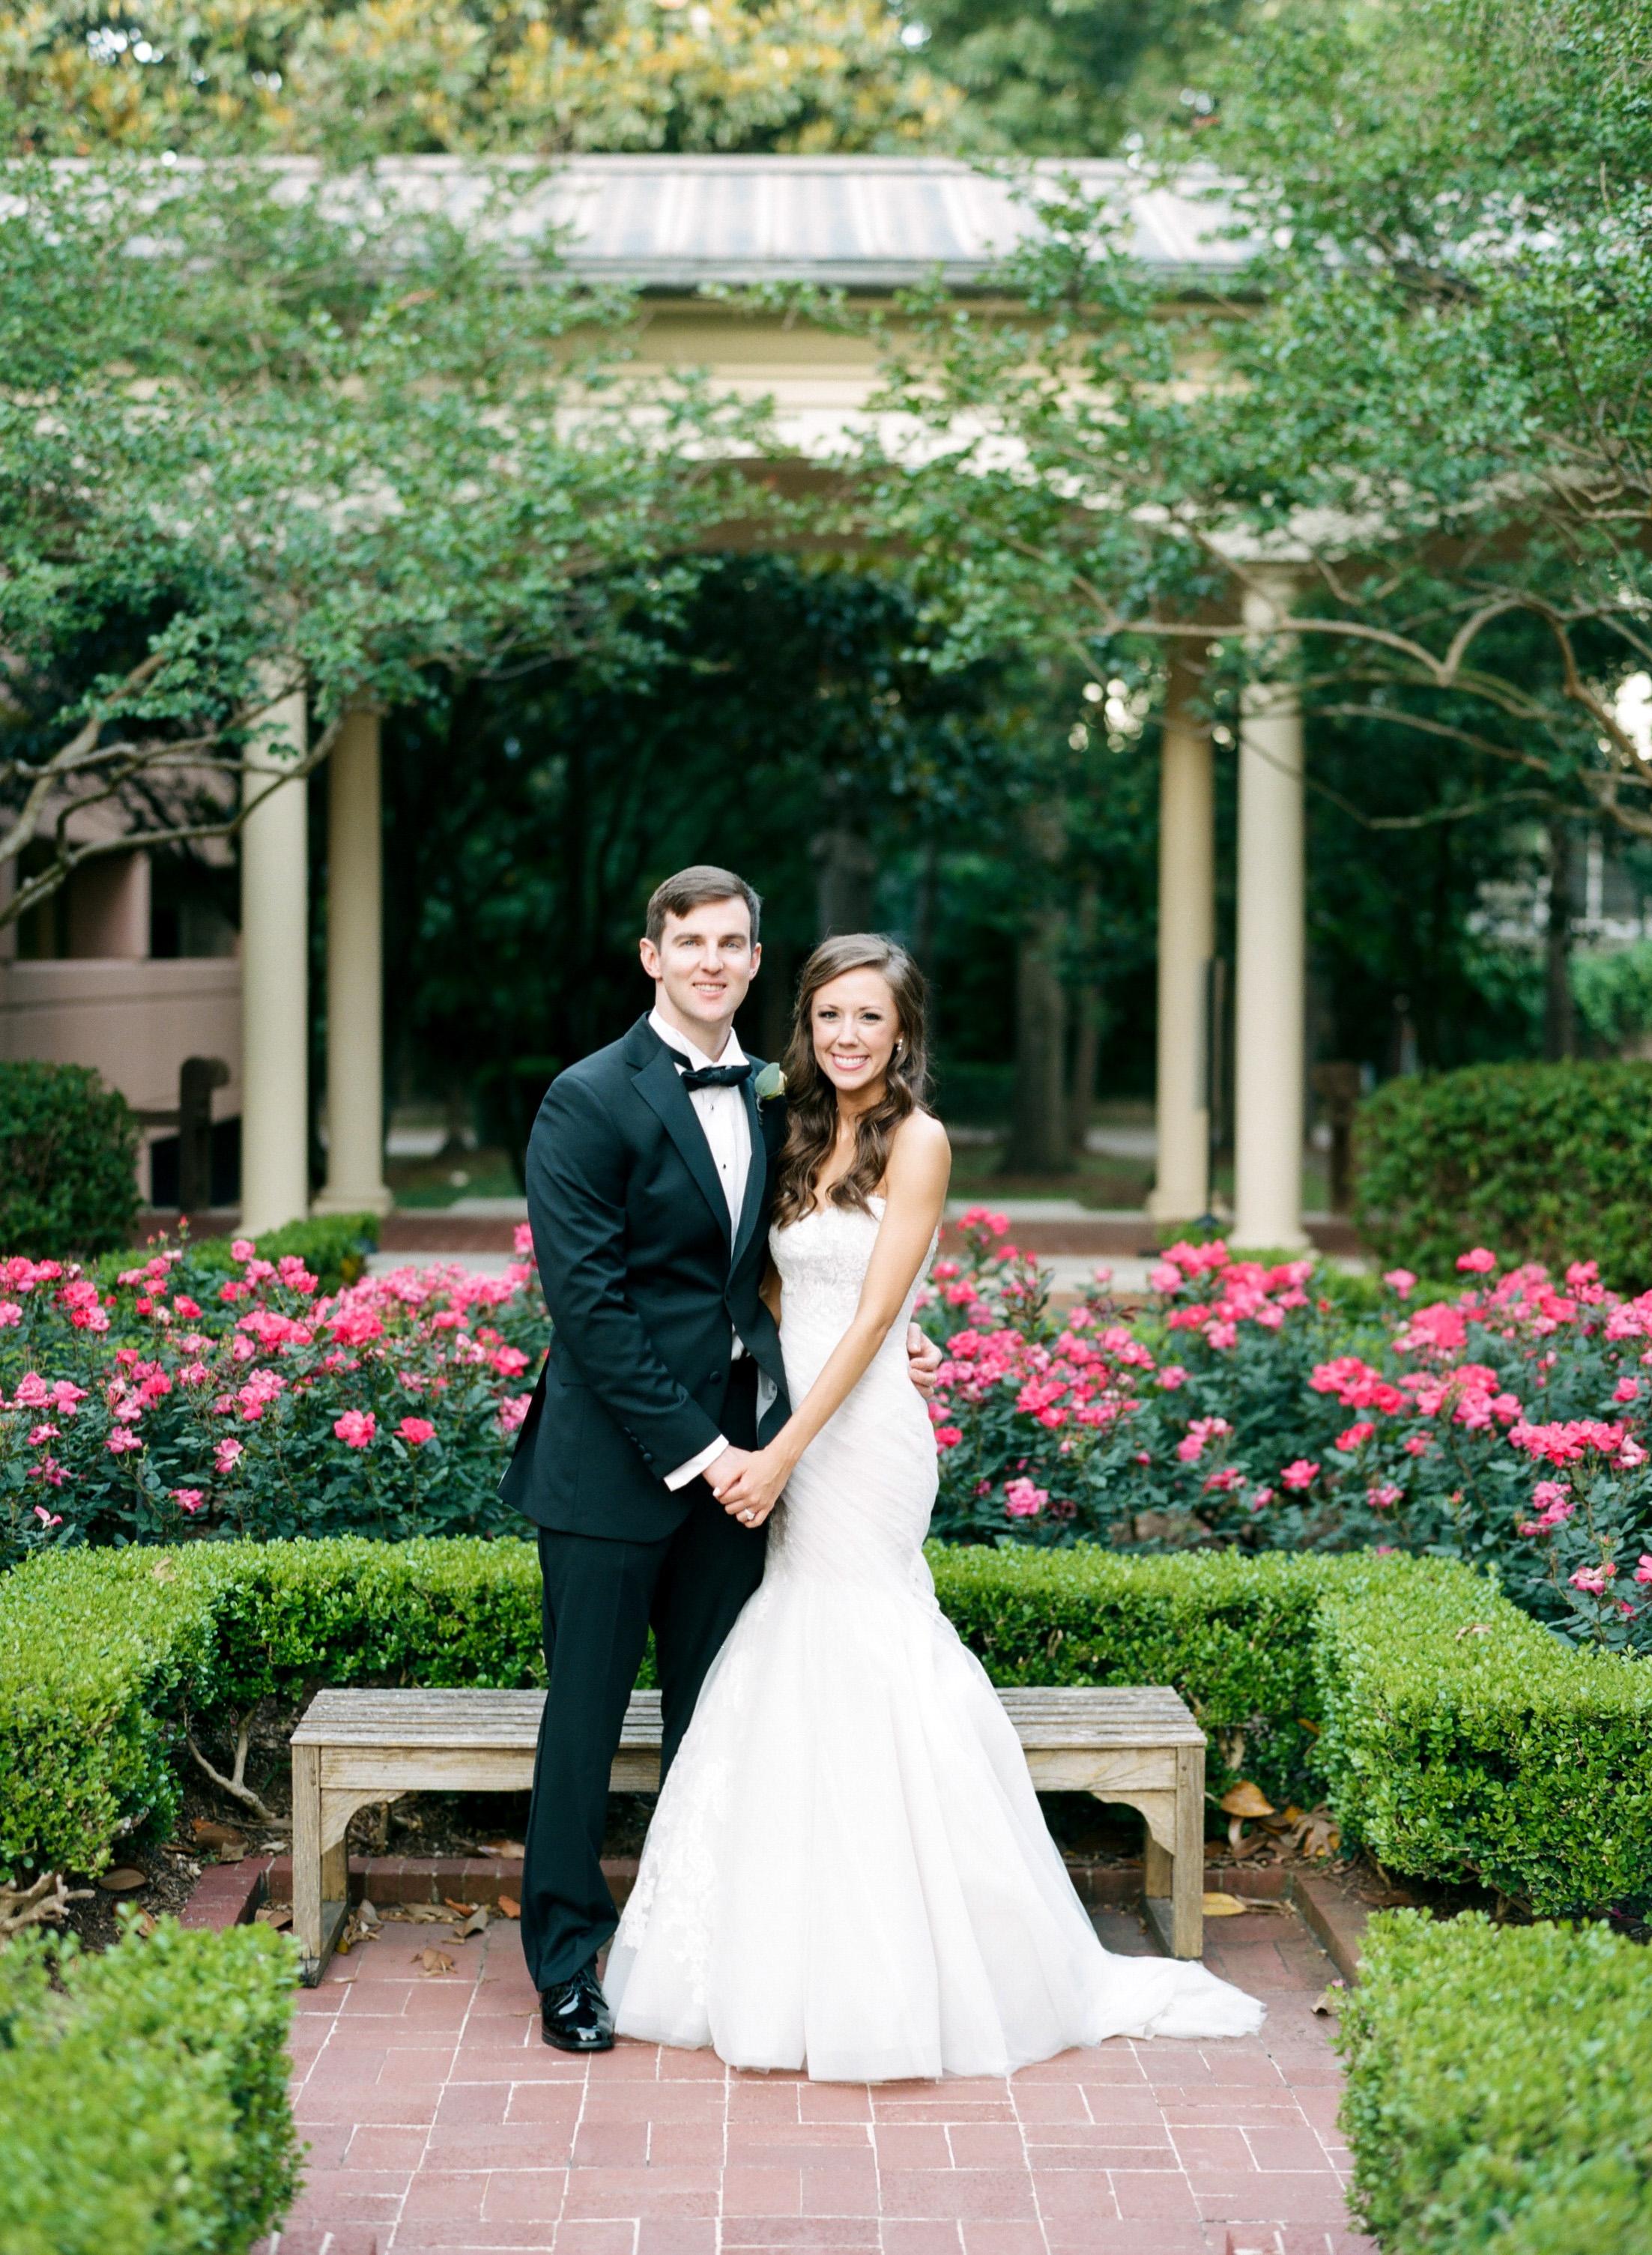 St.-Philip-Presbyterian-Church-Houston-Wedding-Ceremony-The-Junior-League-Of-Houston-Reception-Dana-Fernandez-Photography-Fine-Art-Film-20.jpg